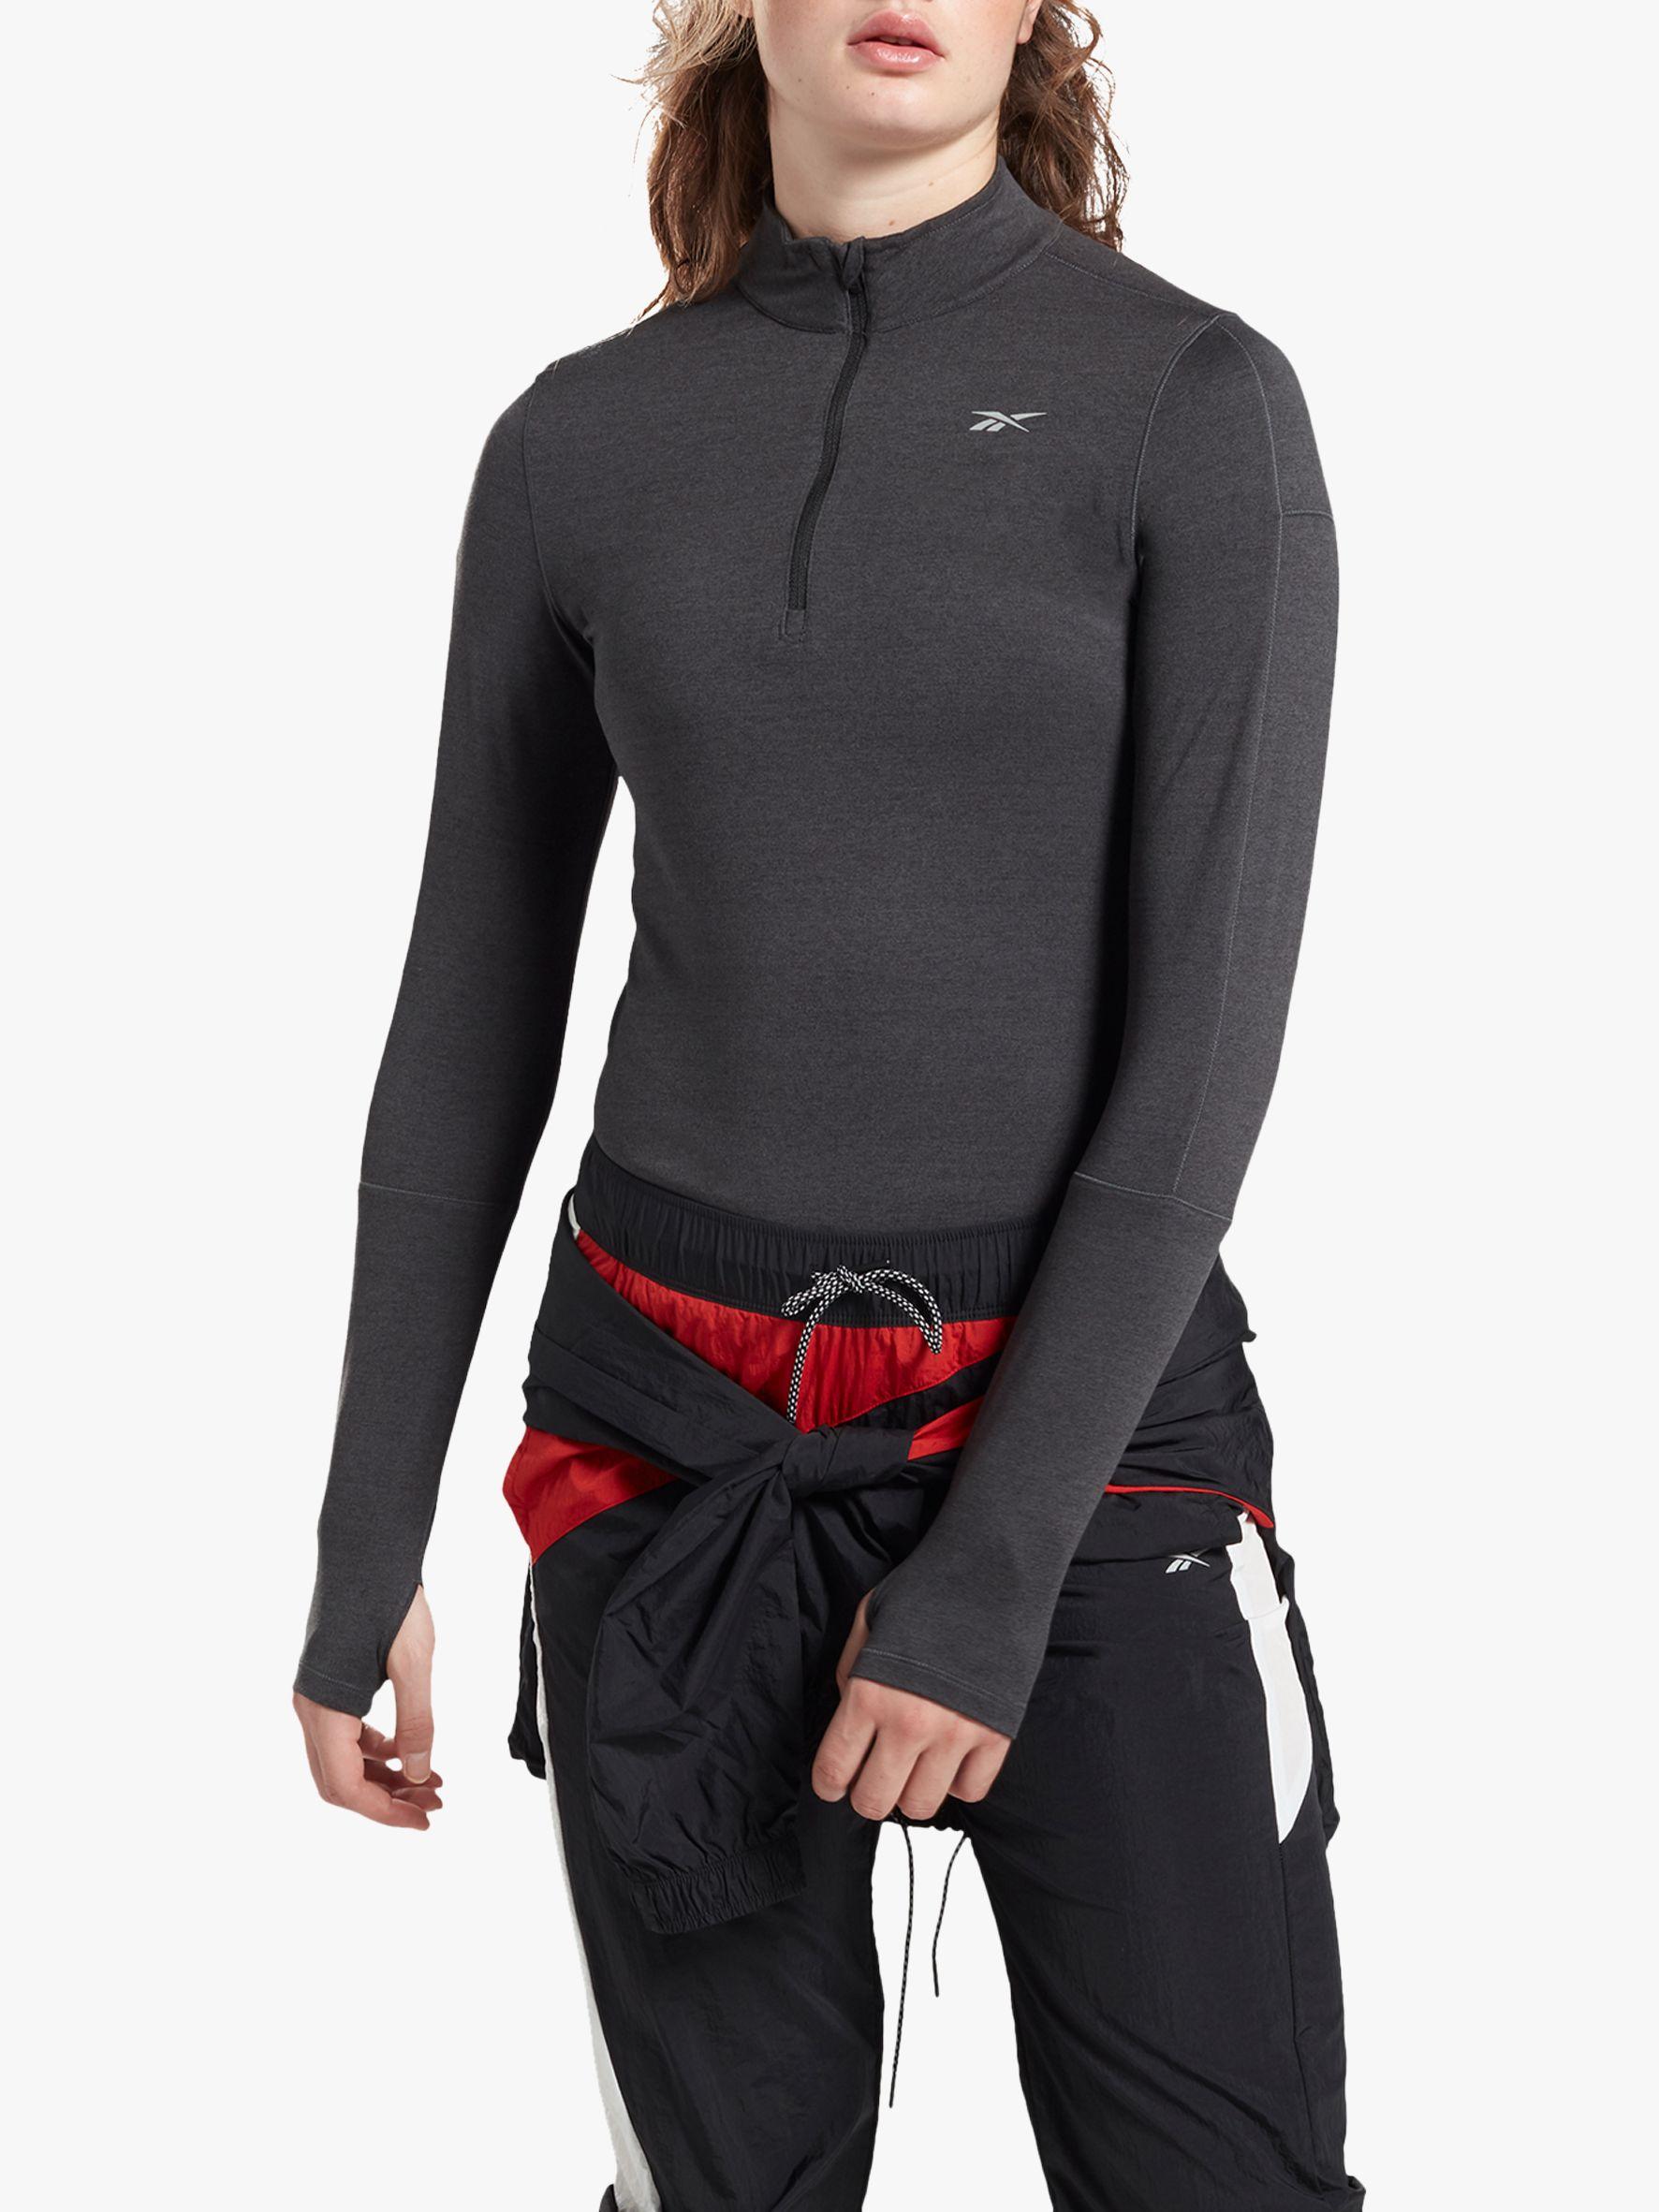 Reebok Reebok Training Essentials Sweatshirt, Charcoal